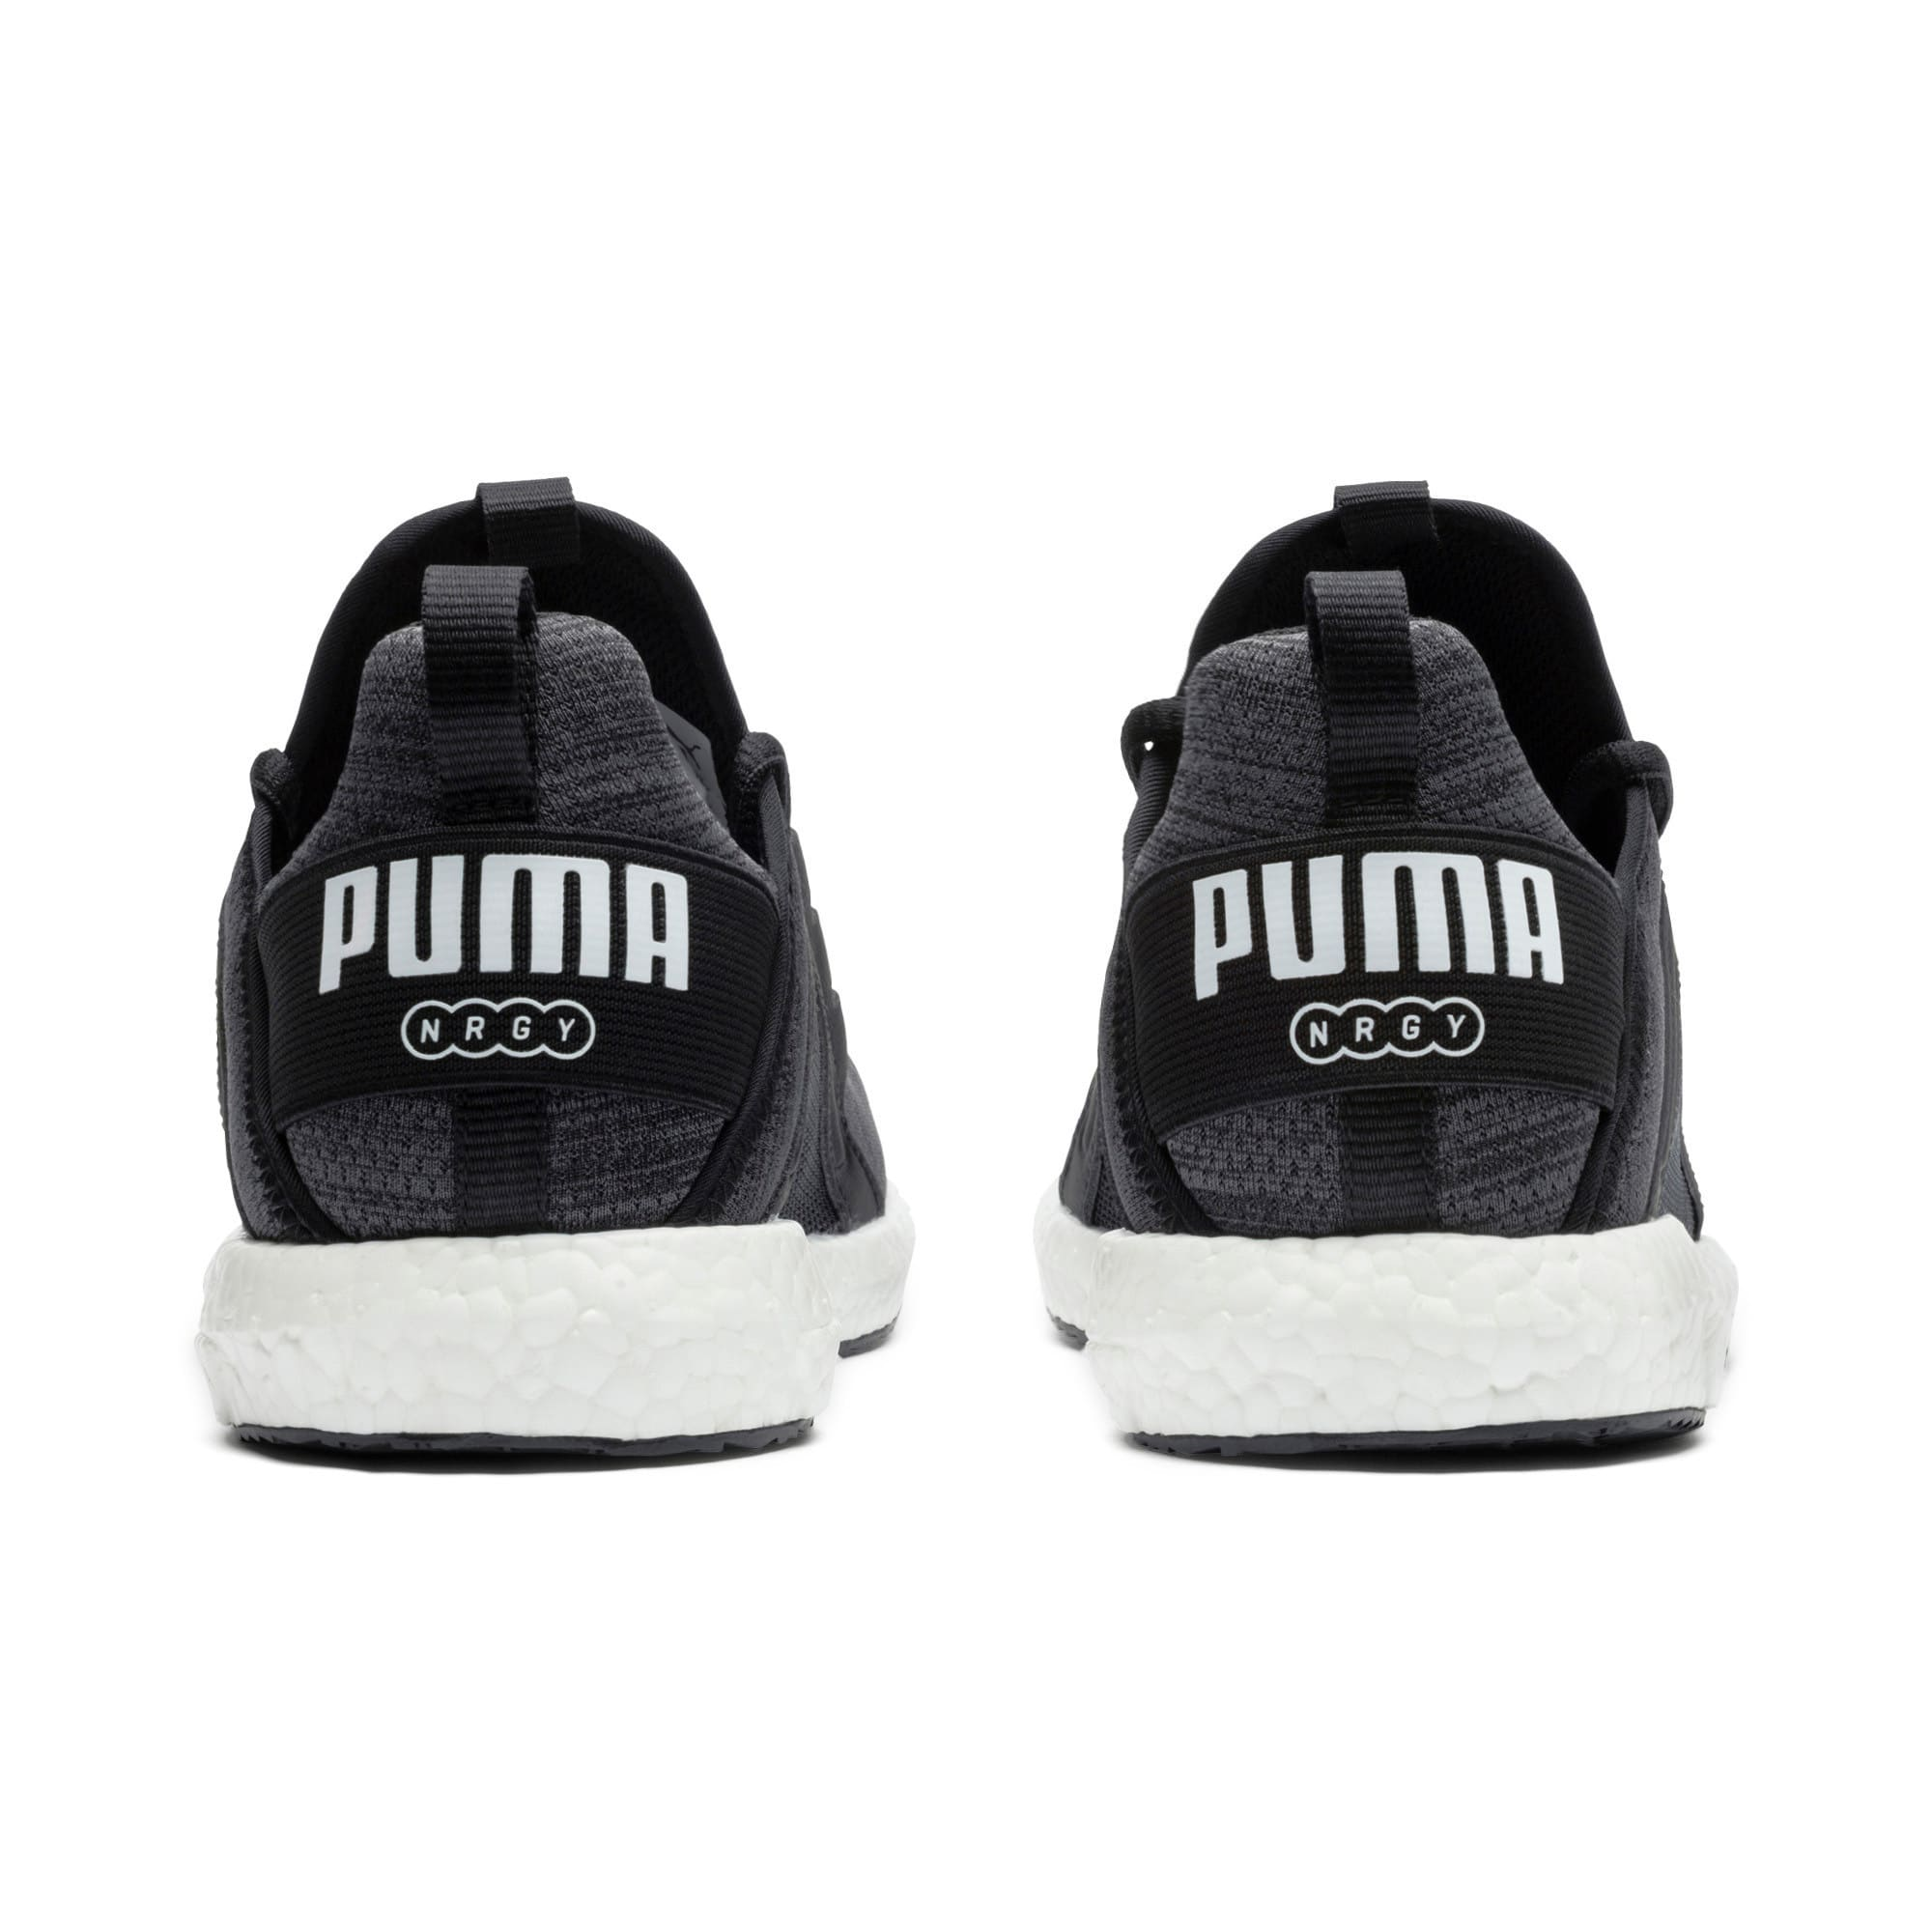 Thumbnail 2 of Mega Energy Heather Knit Women's Running Shoes, Black-Iron Gate-White, medium-IND